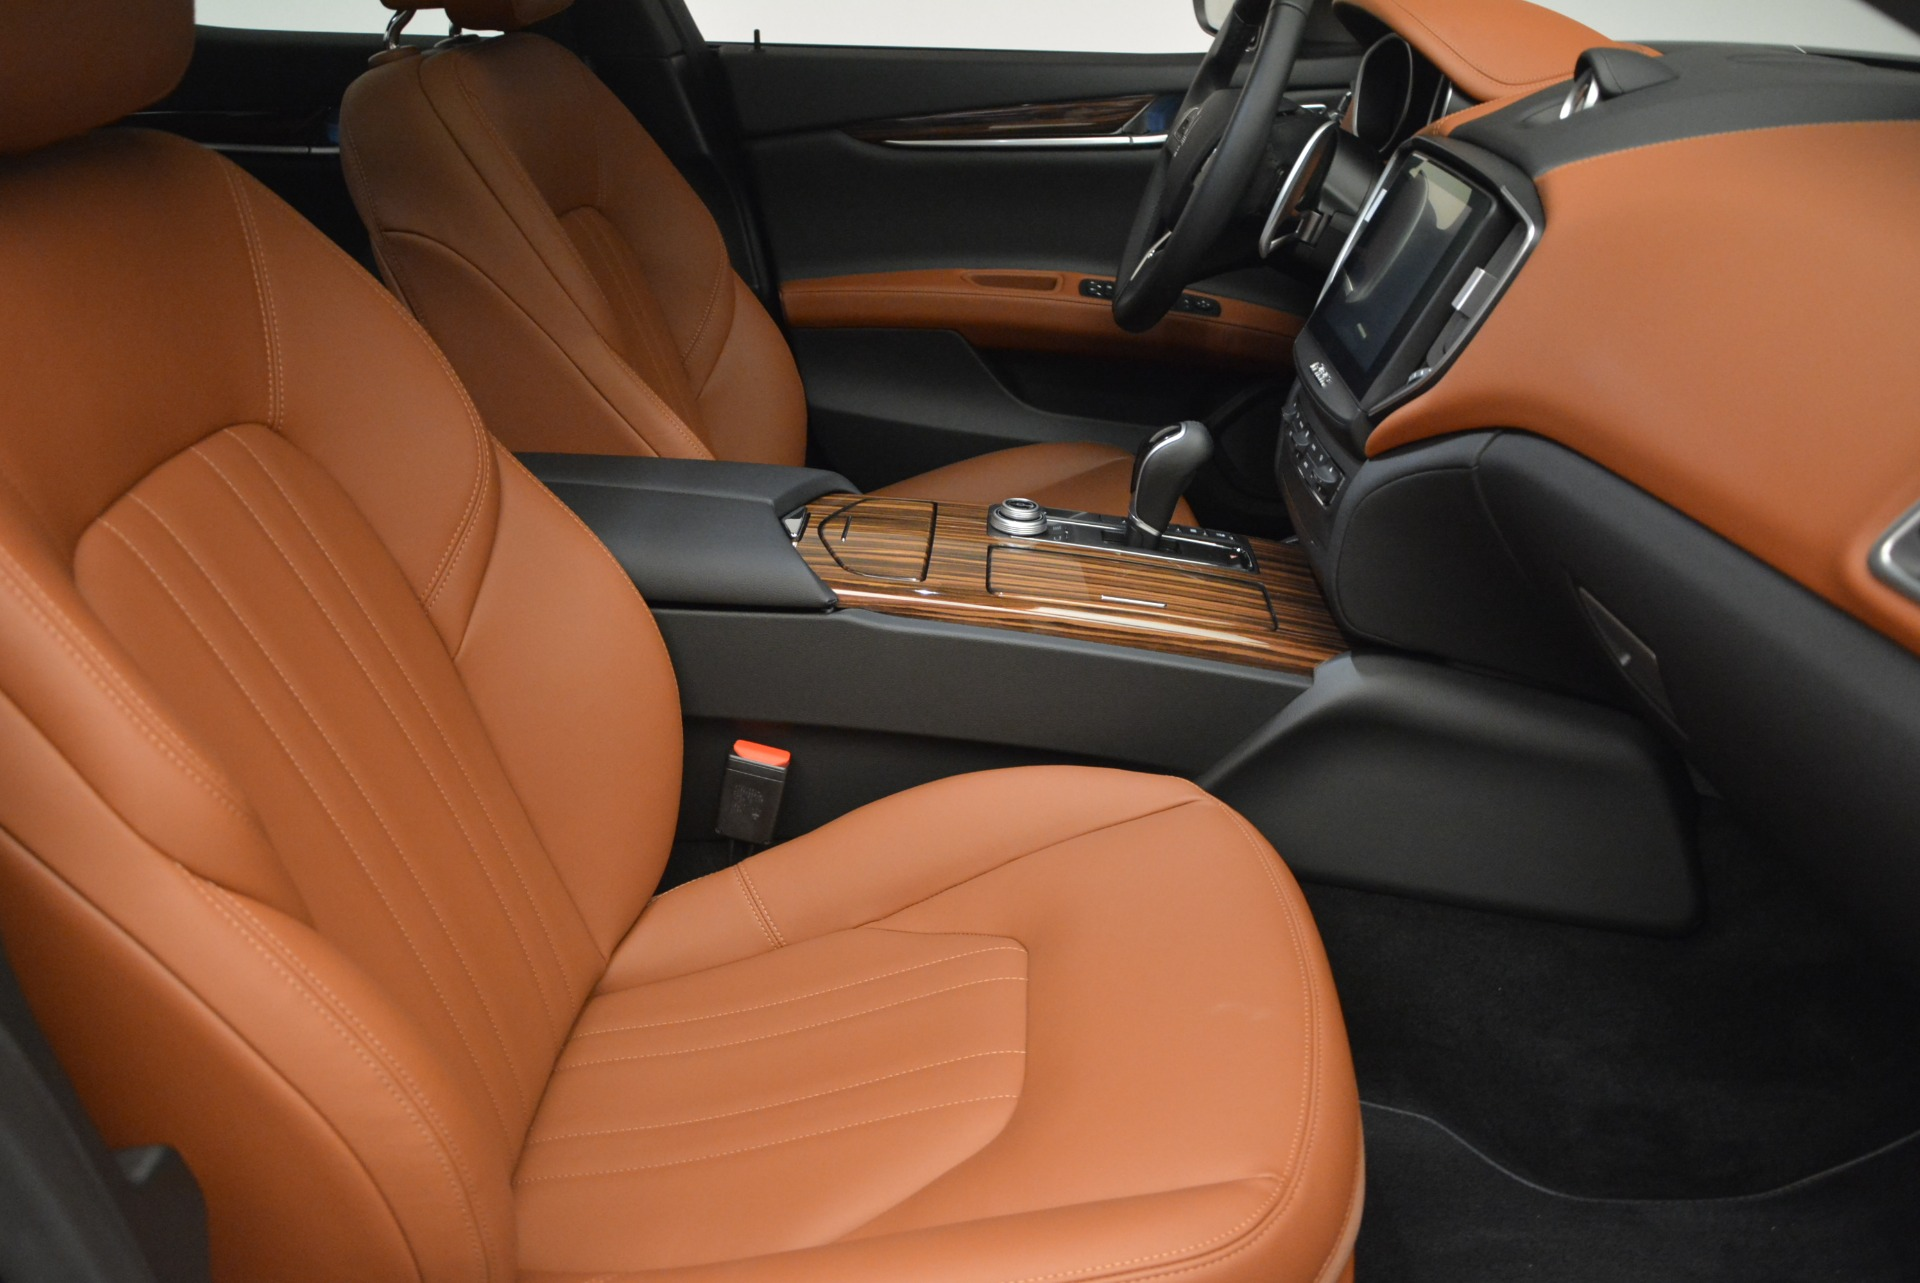 Used 2017 Maserati Ghibli S Q4 Ex-Loaner For Sale In Greenwich, CT 719_p21